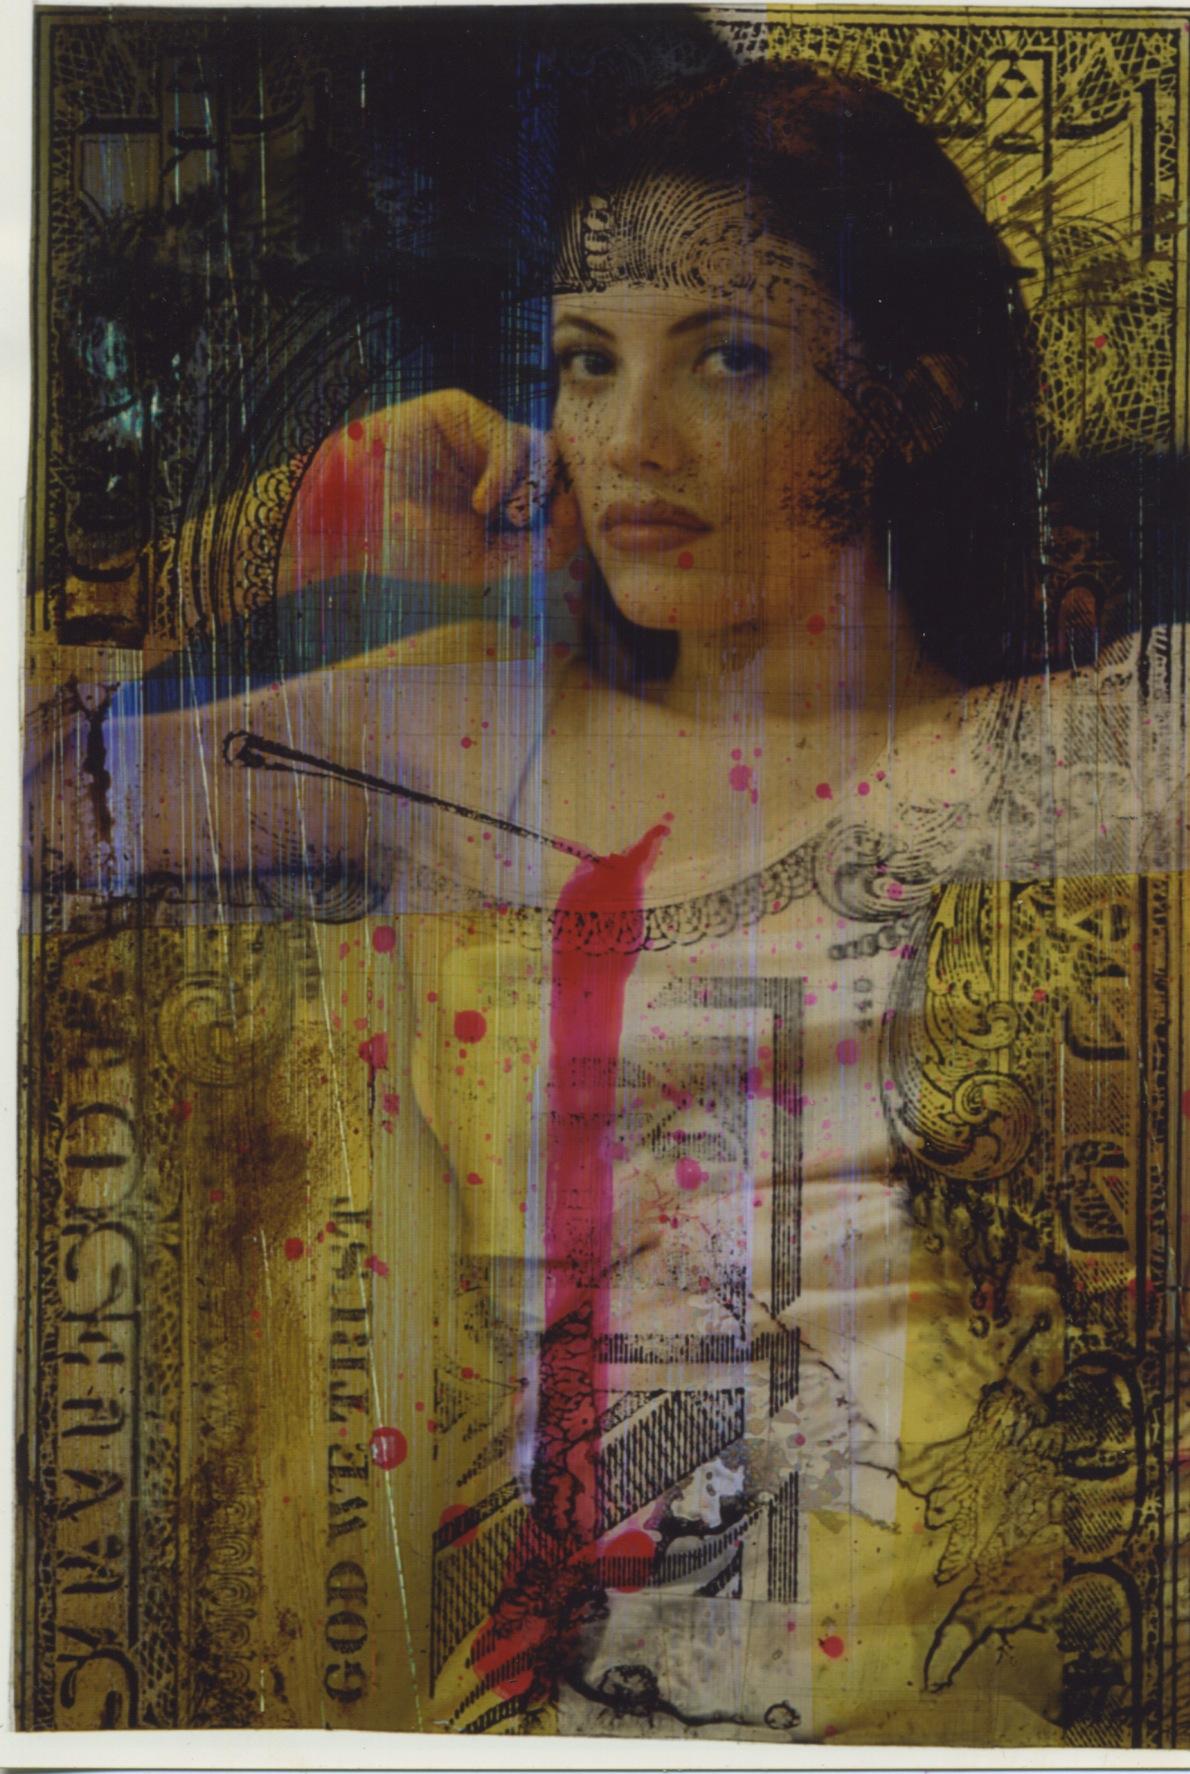 Miss Uruguay 2000